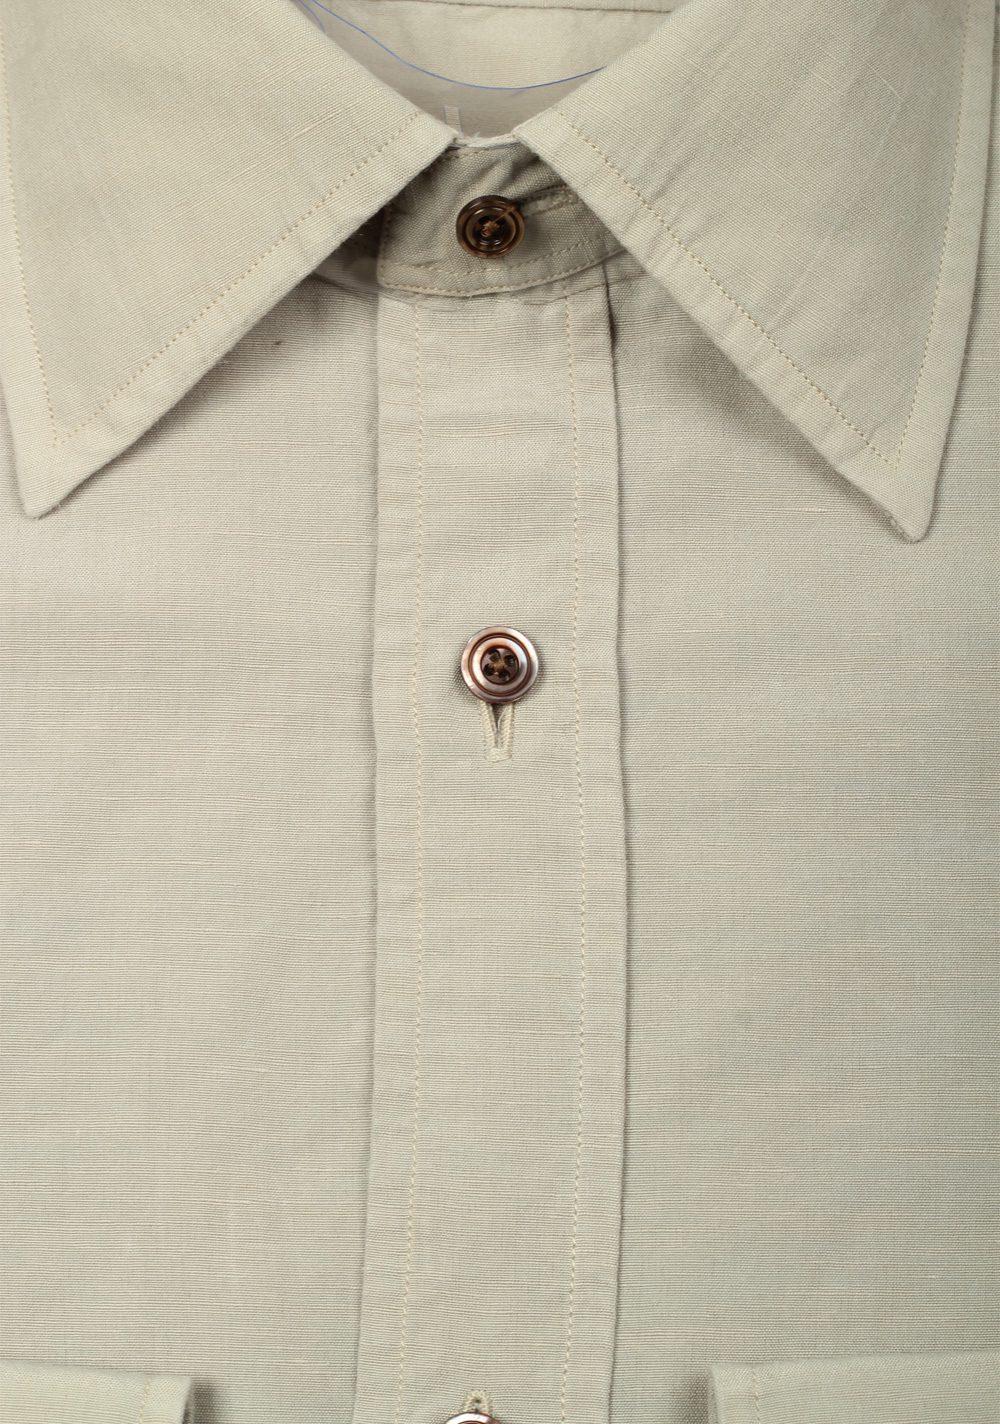 TOM FORD Solid Beige Dress Shirt Size 40 / 15,75 U.S. | Costume Limité